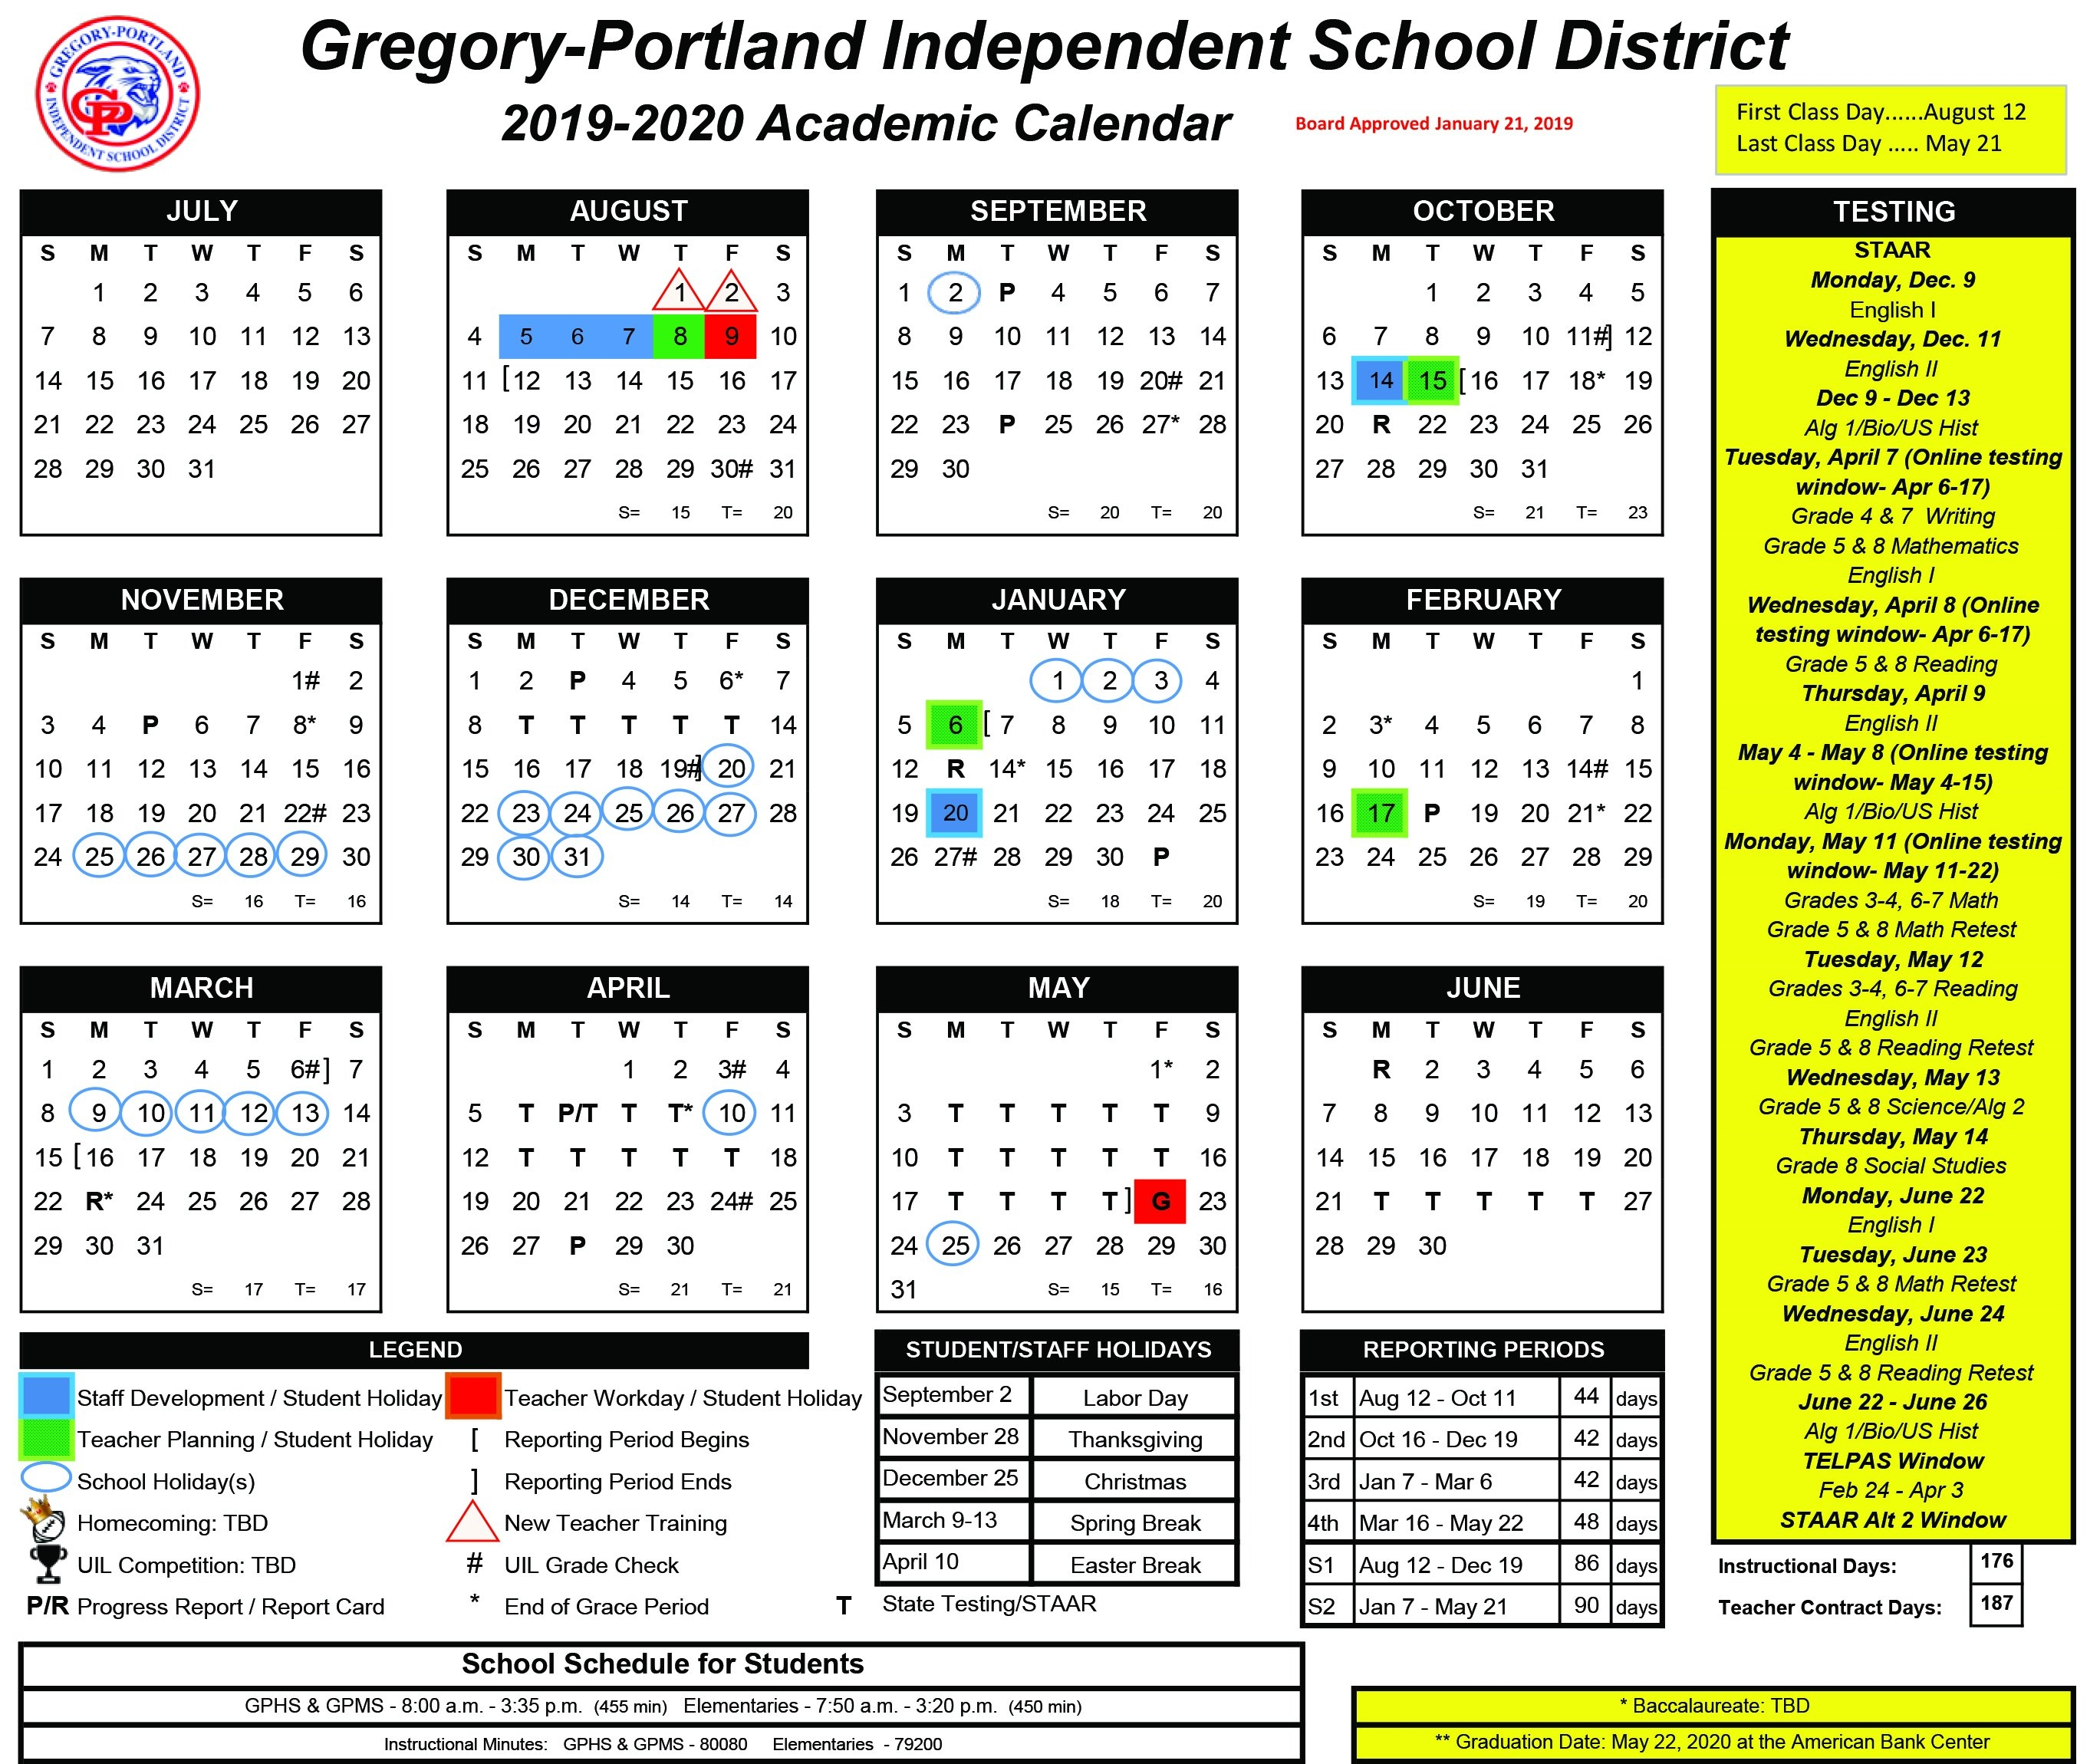 District Calendar, 2019-20 - Gregory-Portland Independent School Discover 5 Calendar 2019